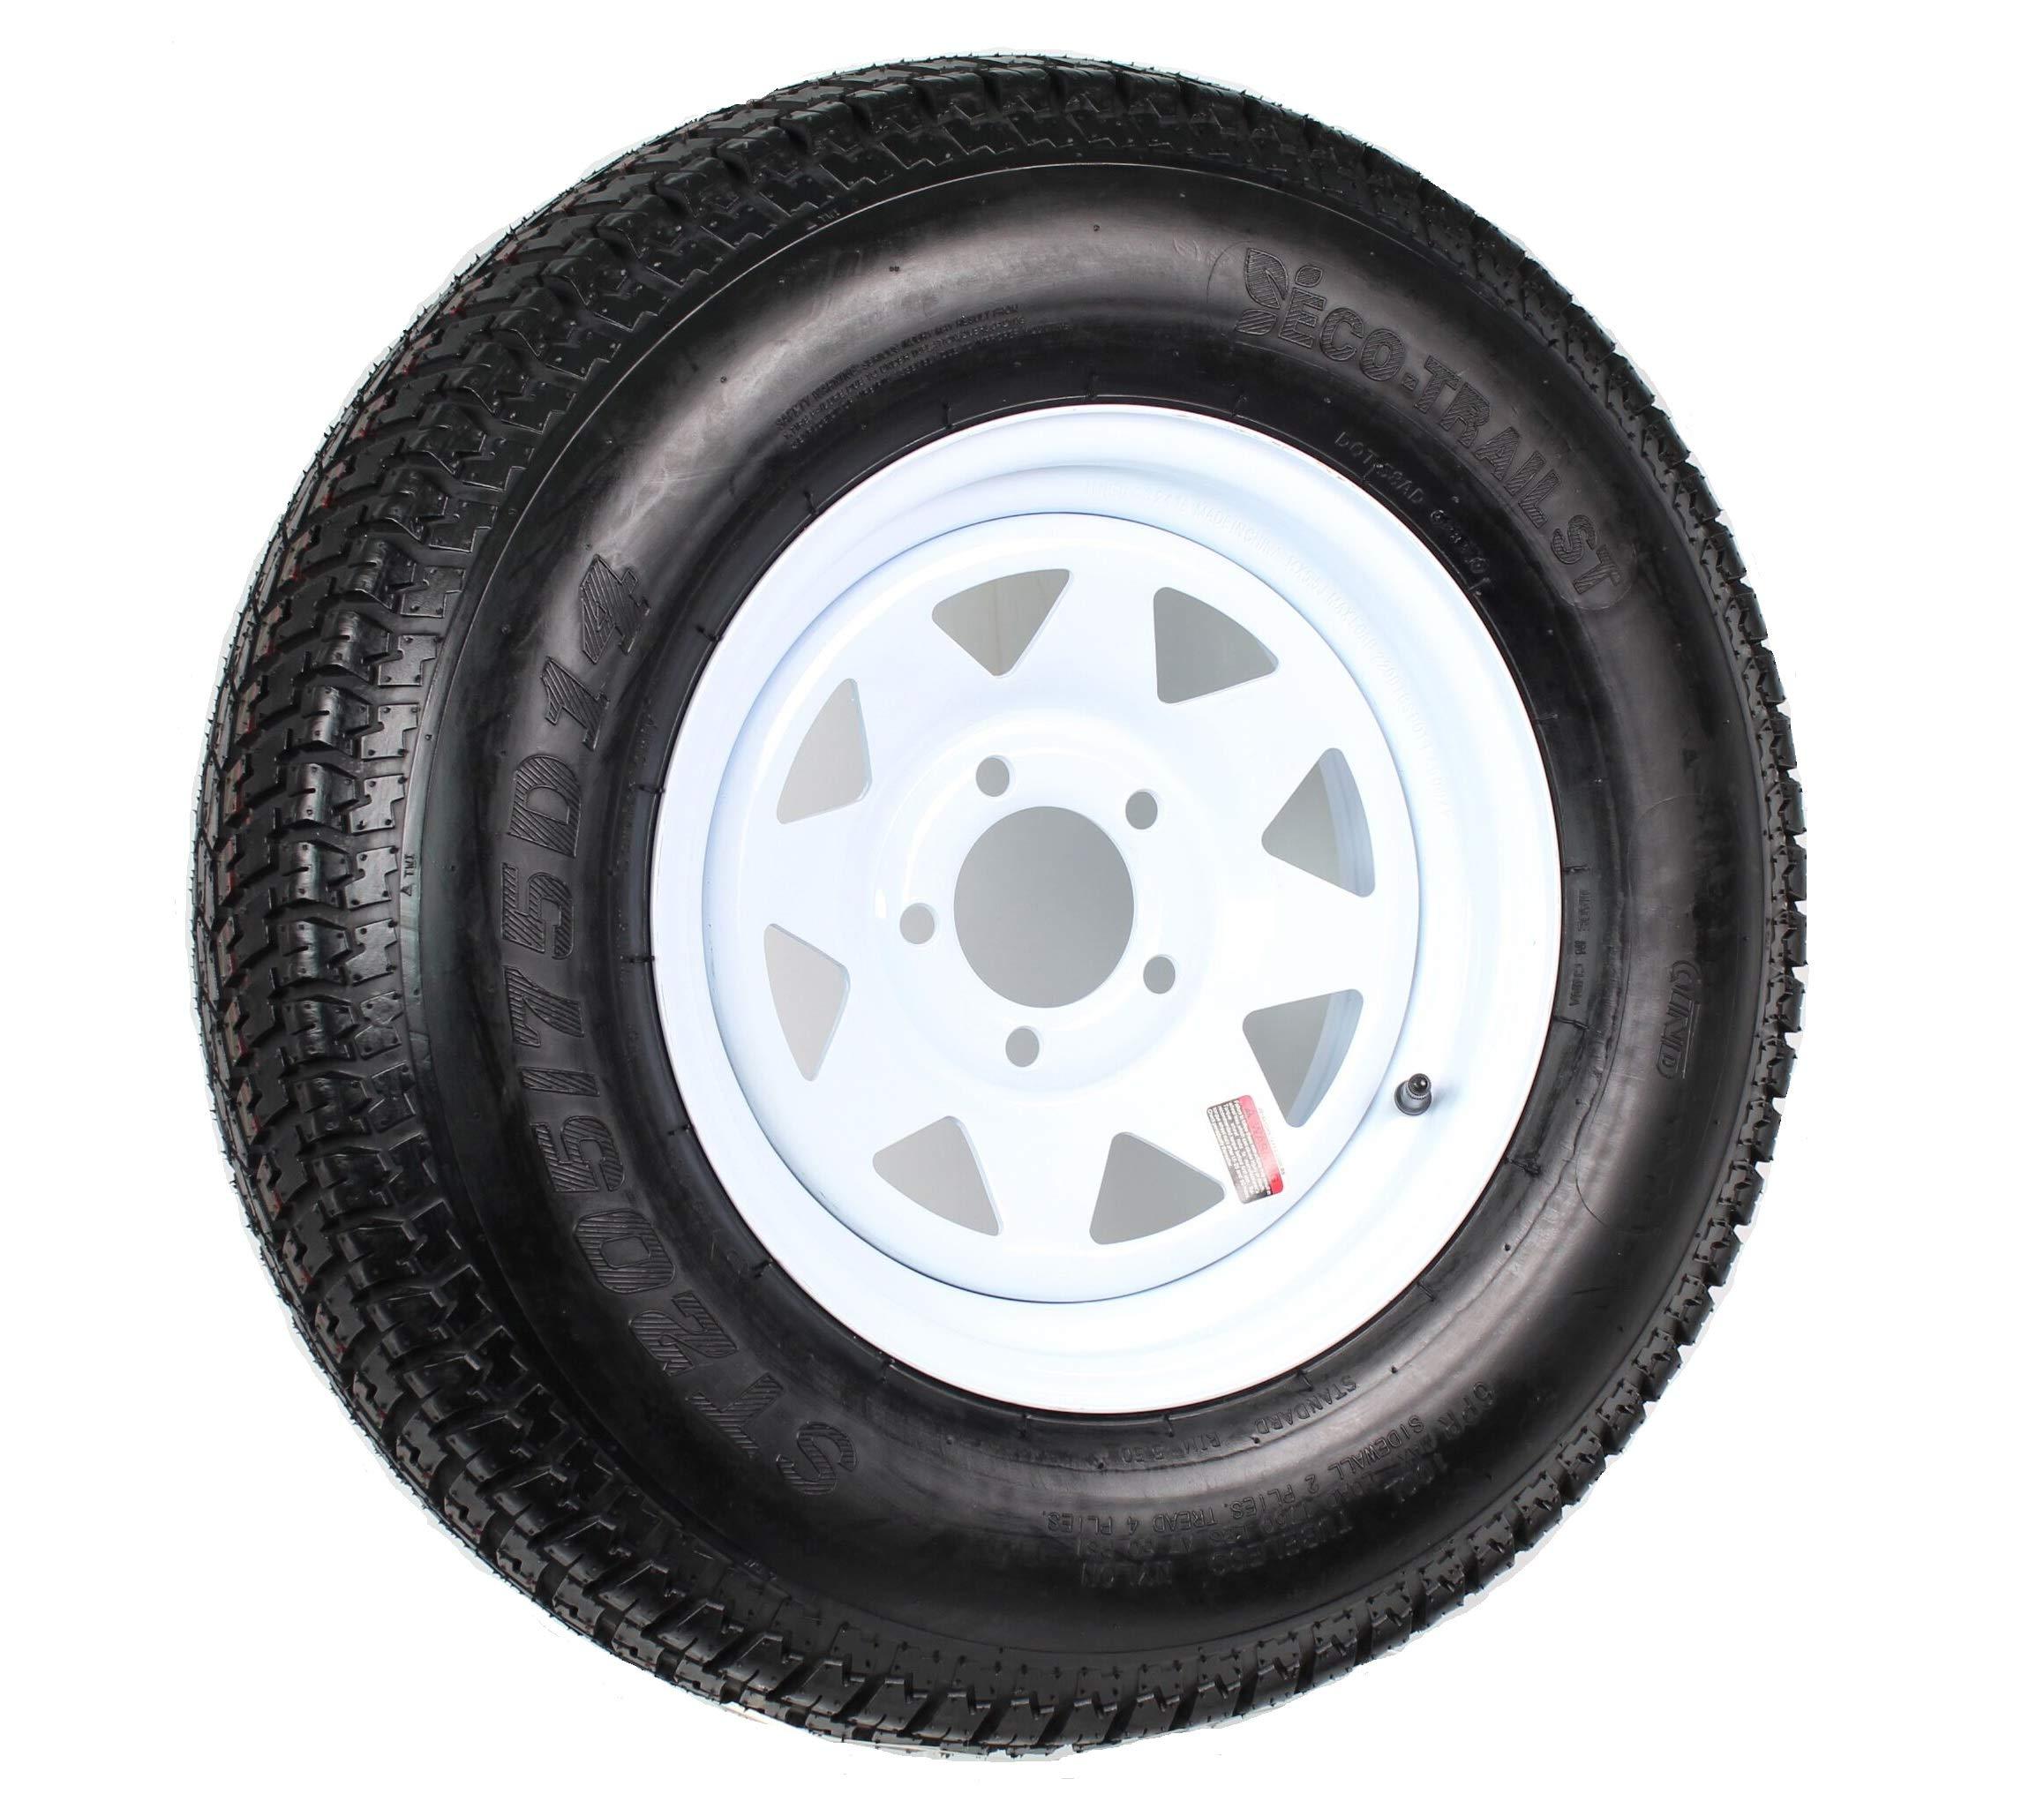 205/75D14 Trailer Tire (205/75D14 Trailer Tire - White Spoke Rim)